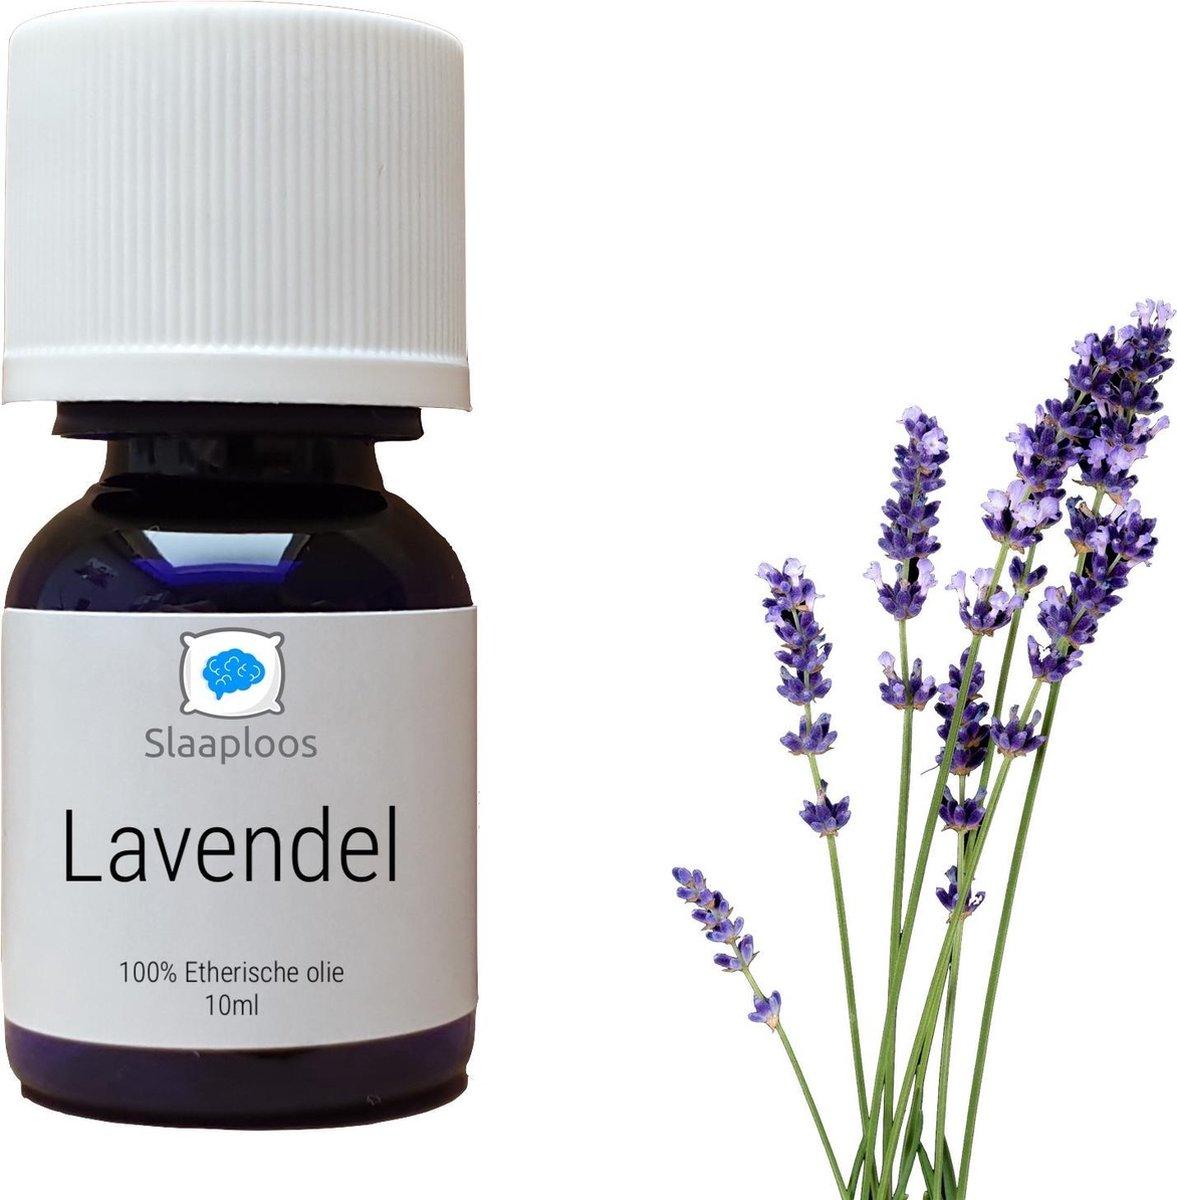 Slaaploos Lavendelolie - 100% Pure Etherische Lavendel Olie